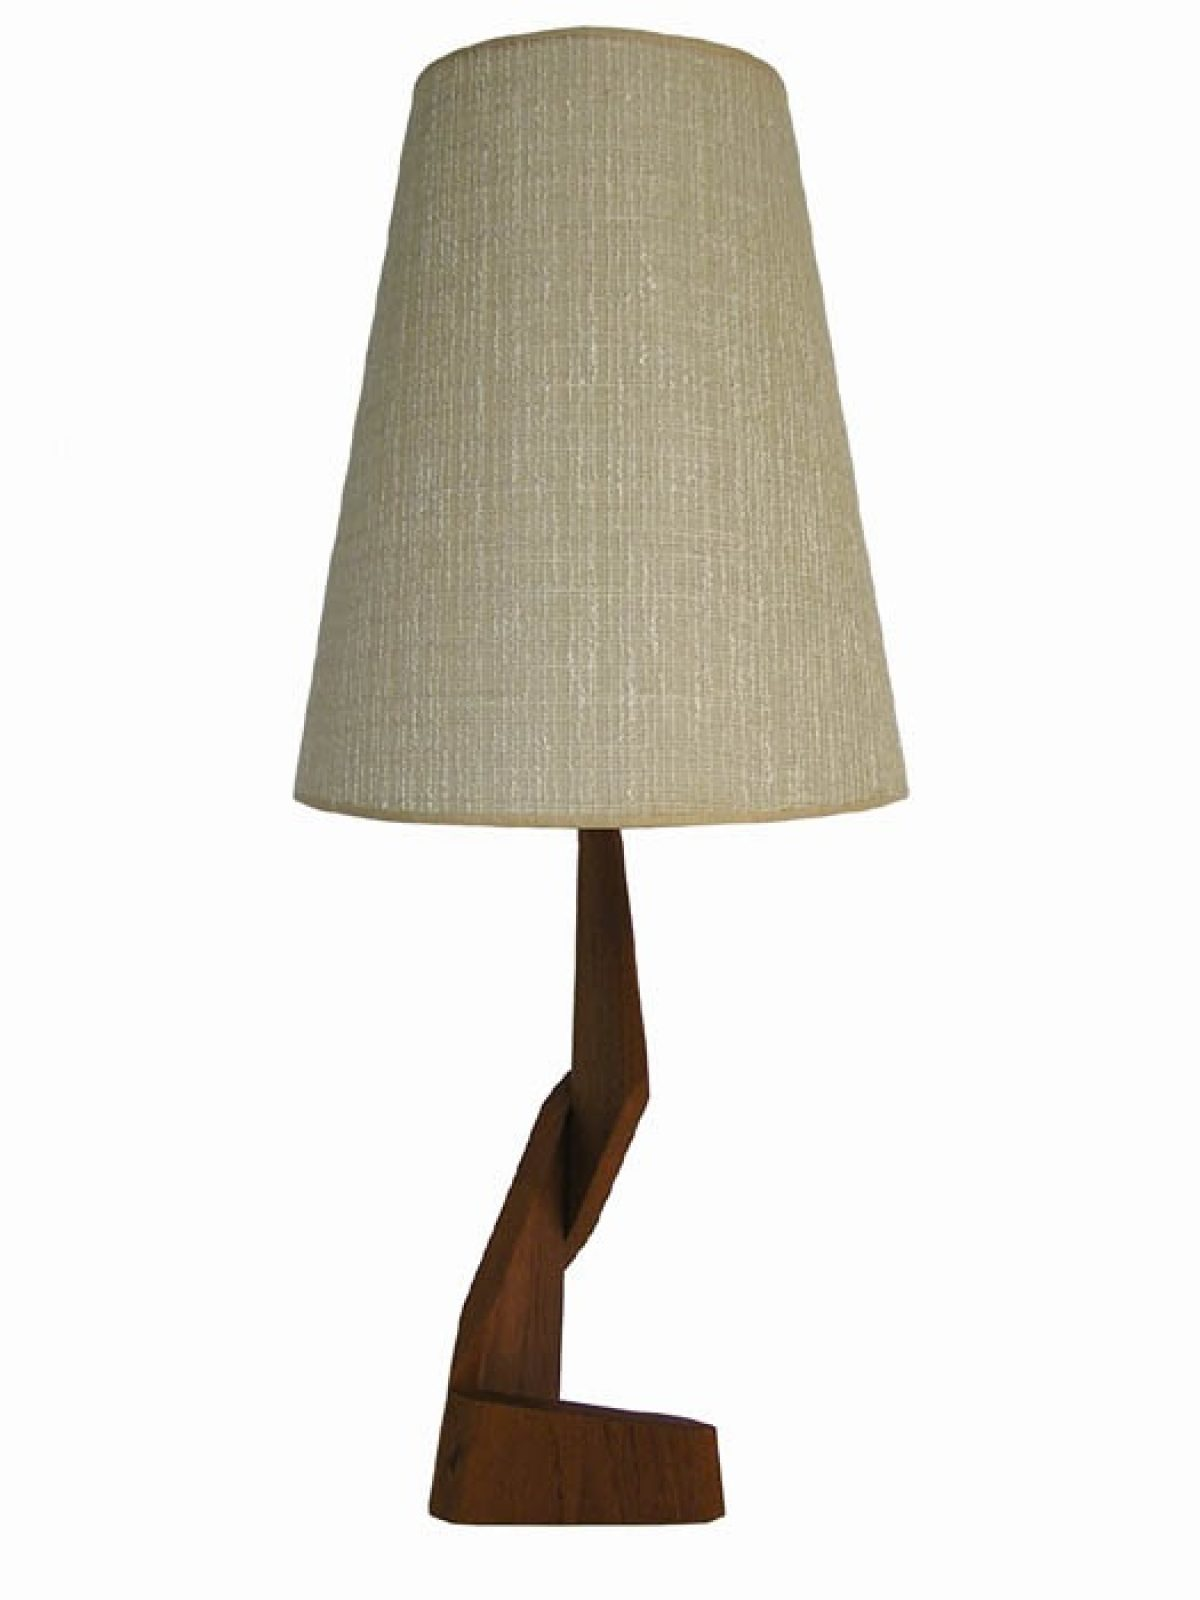 Image of: 1960s Teak Mid Century Modern Zig Zag Table Lamp Hoopers Modern